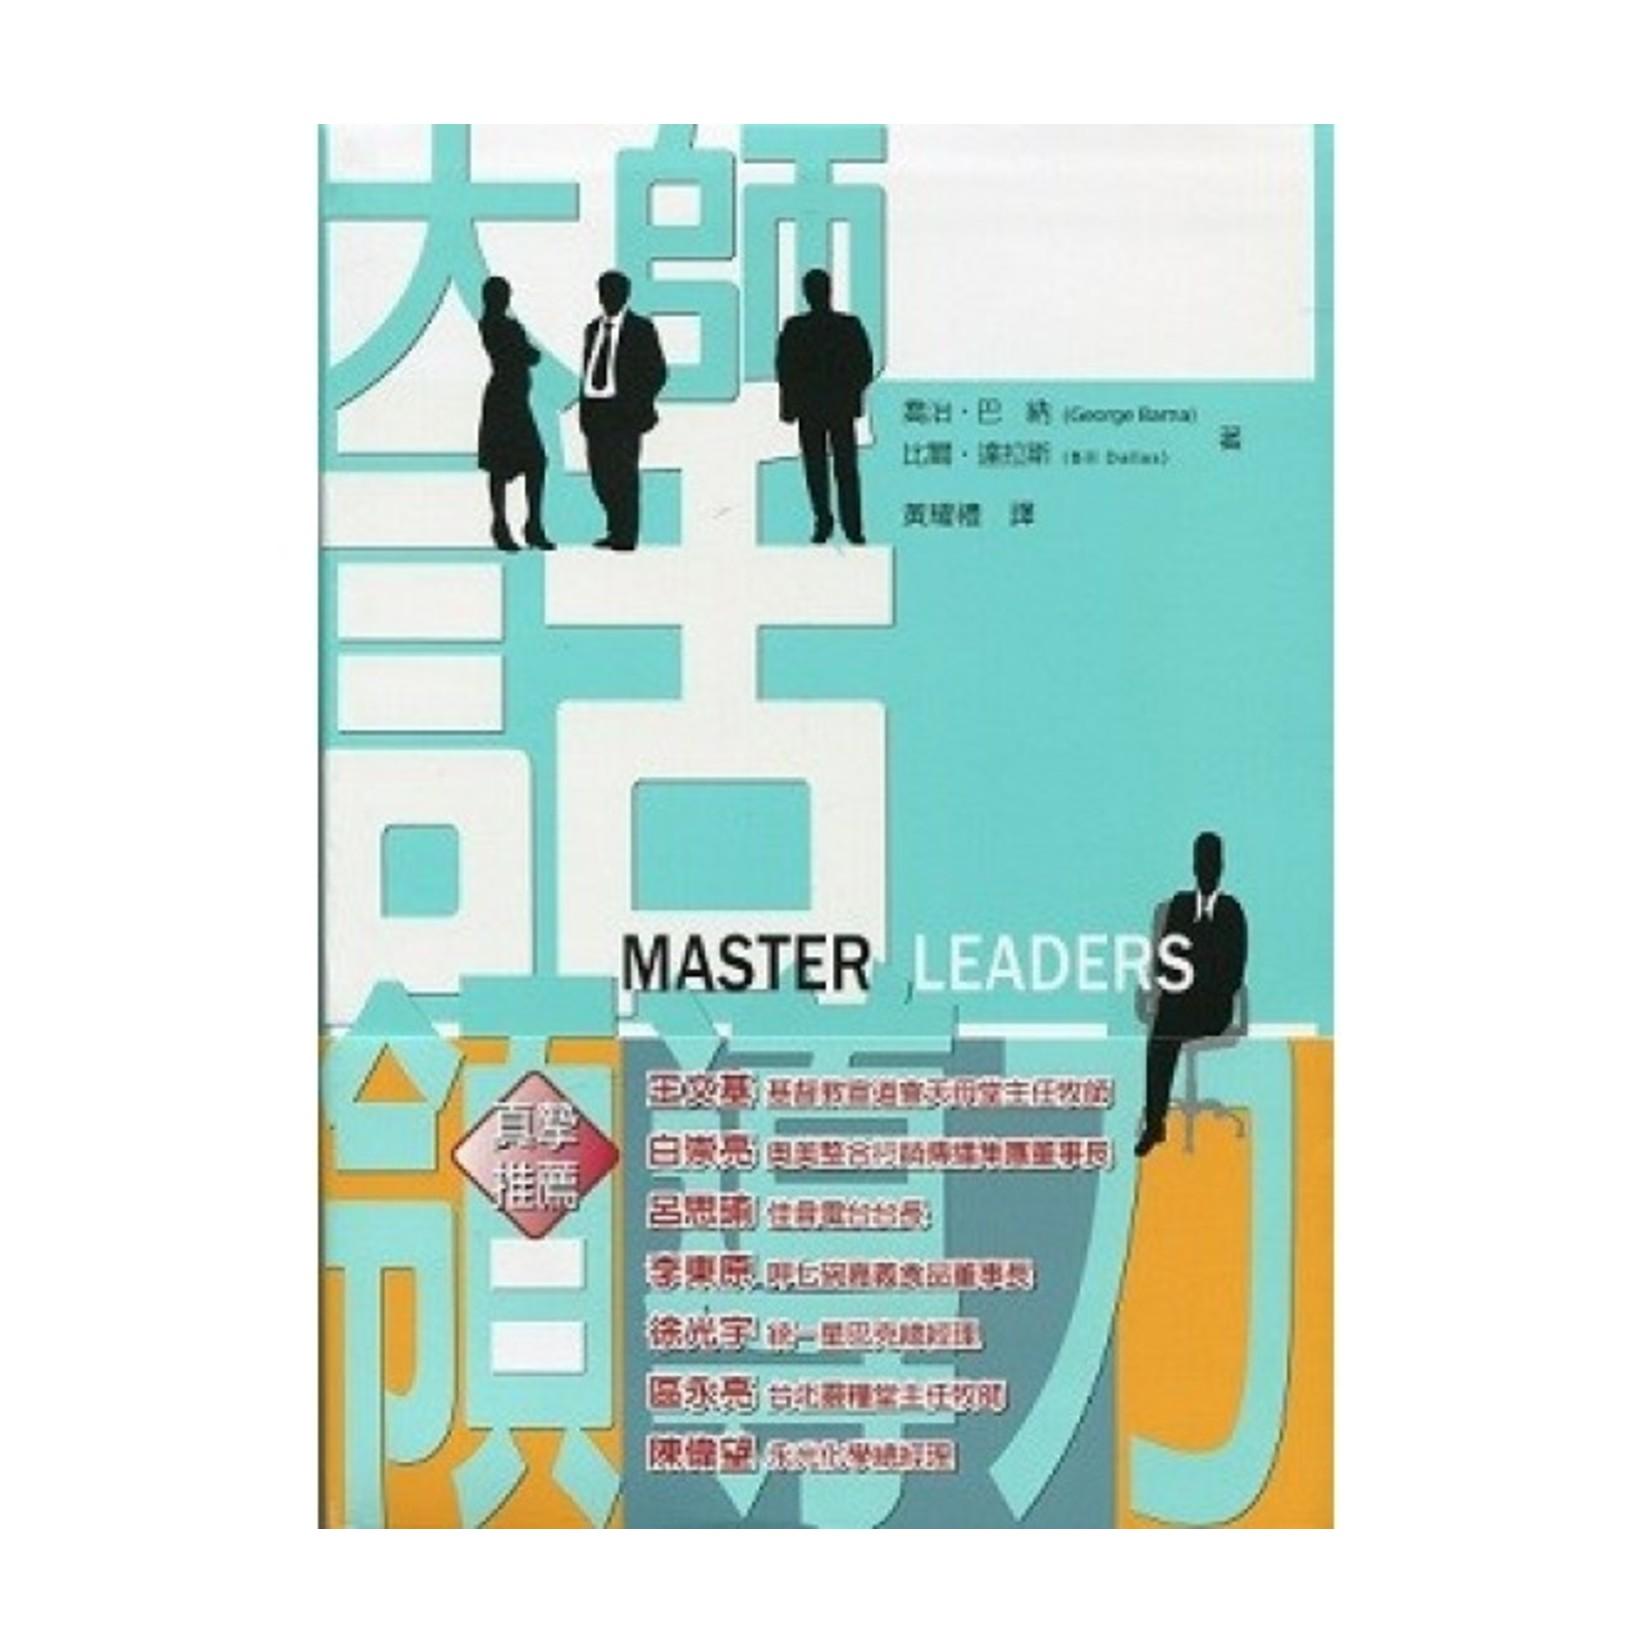 中國主日學協會 China Sunday School Association 大師話領導力 Master Leaders